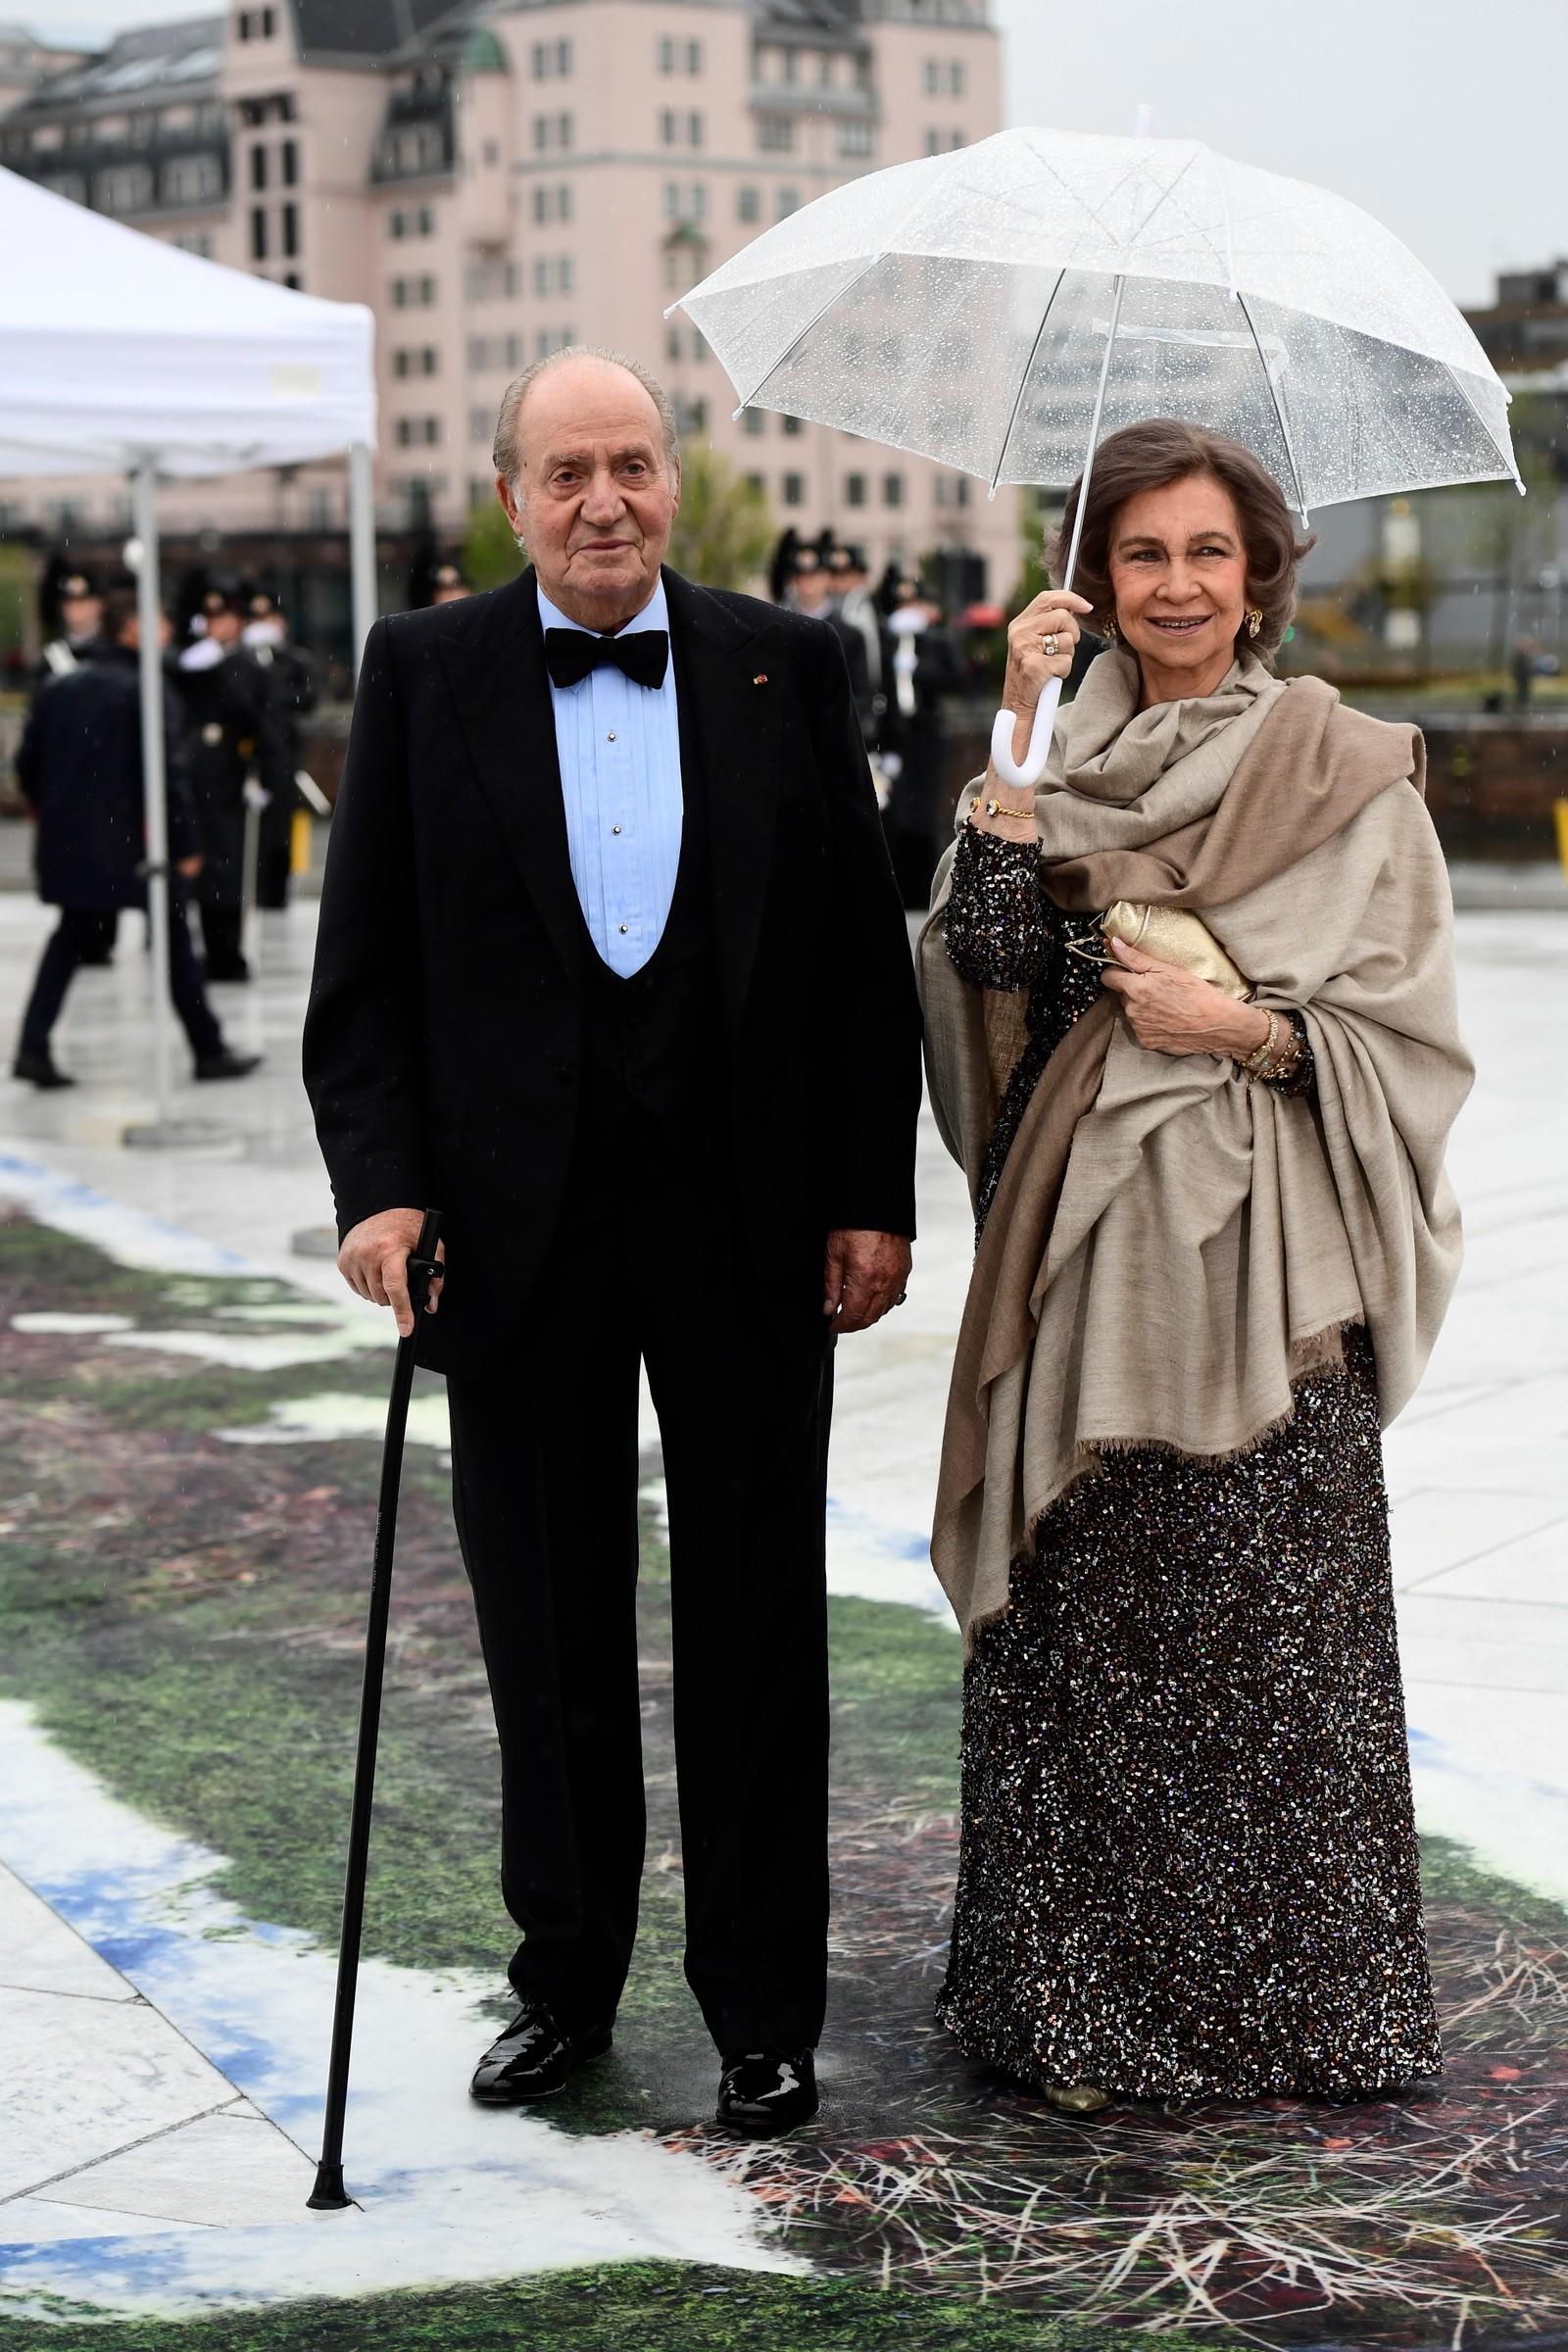 Spanias kong Juan Carlos abdiserte i 2014. Her ankom han med sin dronning Sofia.